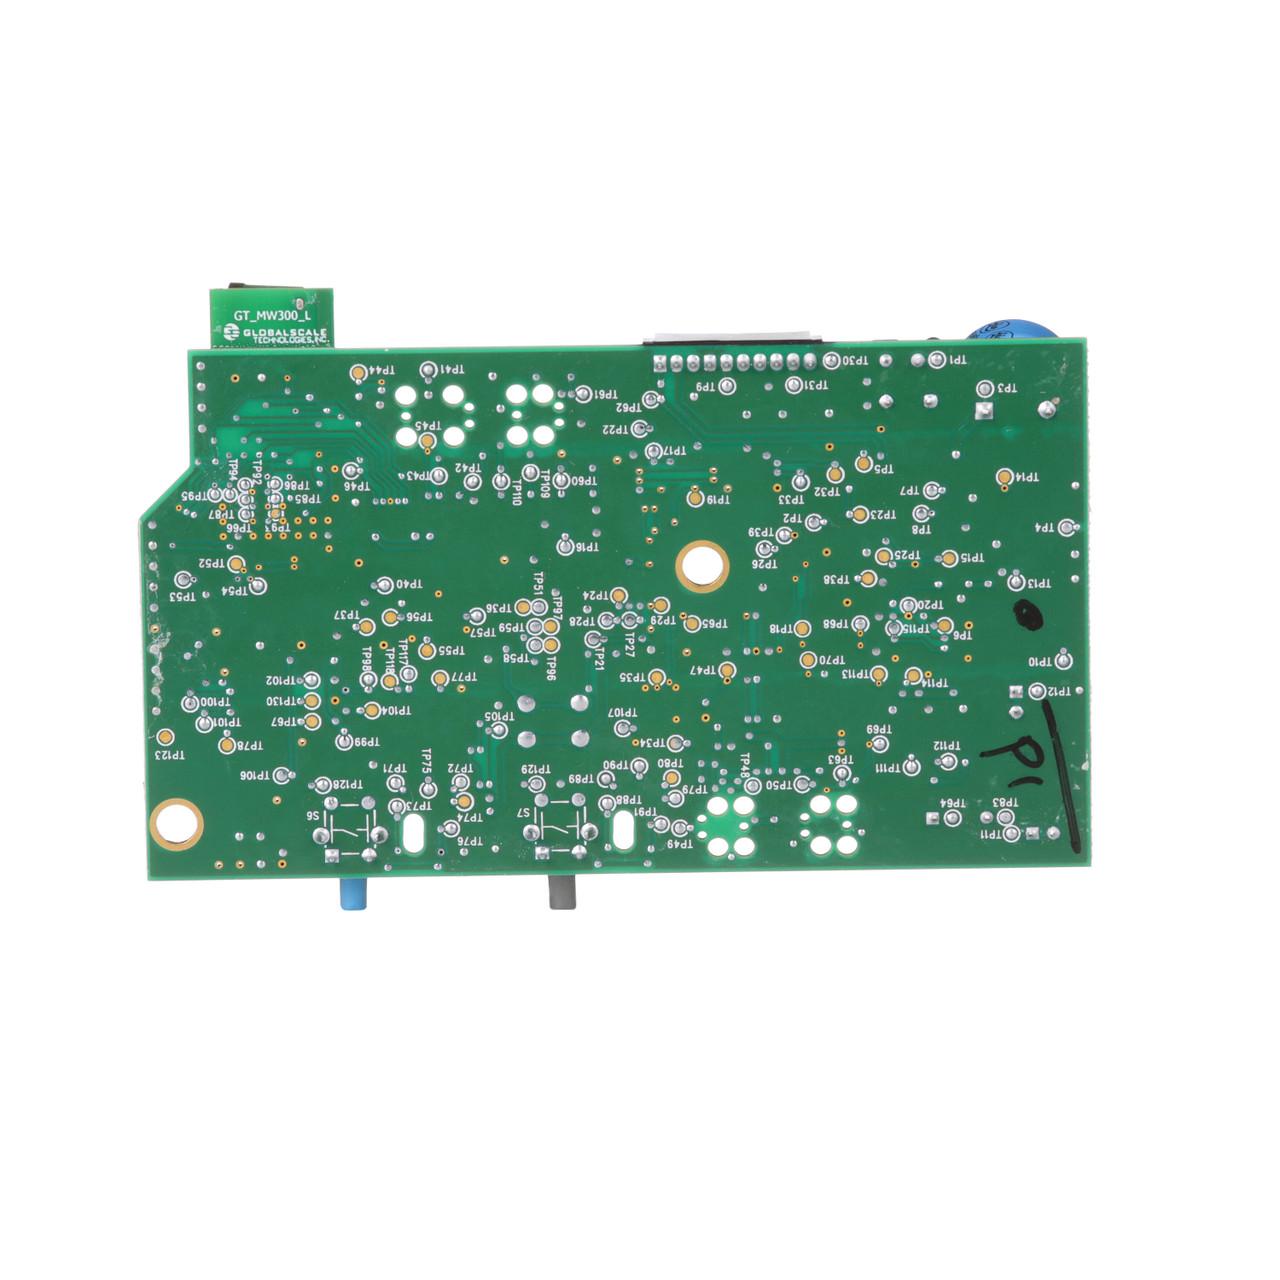 CIRCUIT BOARD ASSEMBLY - IDCM (1129 & 2129)